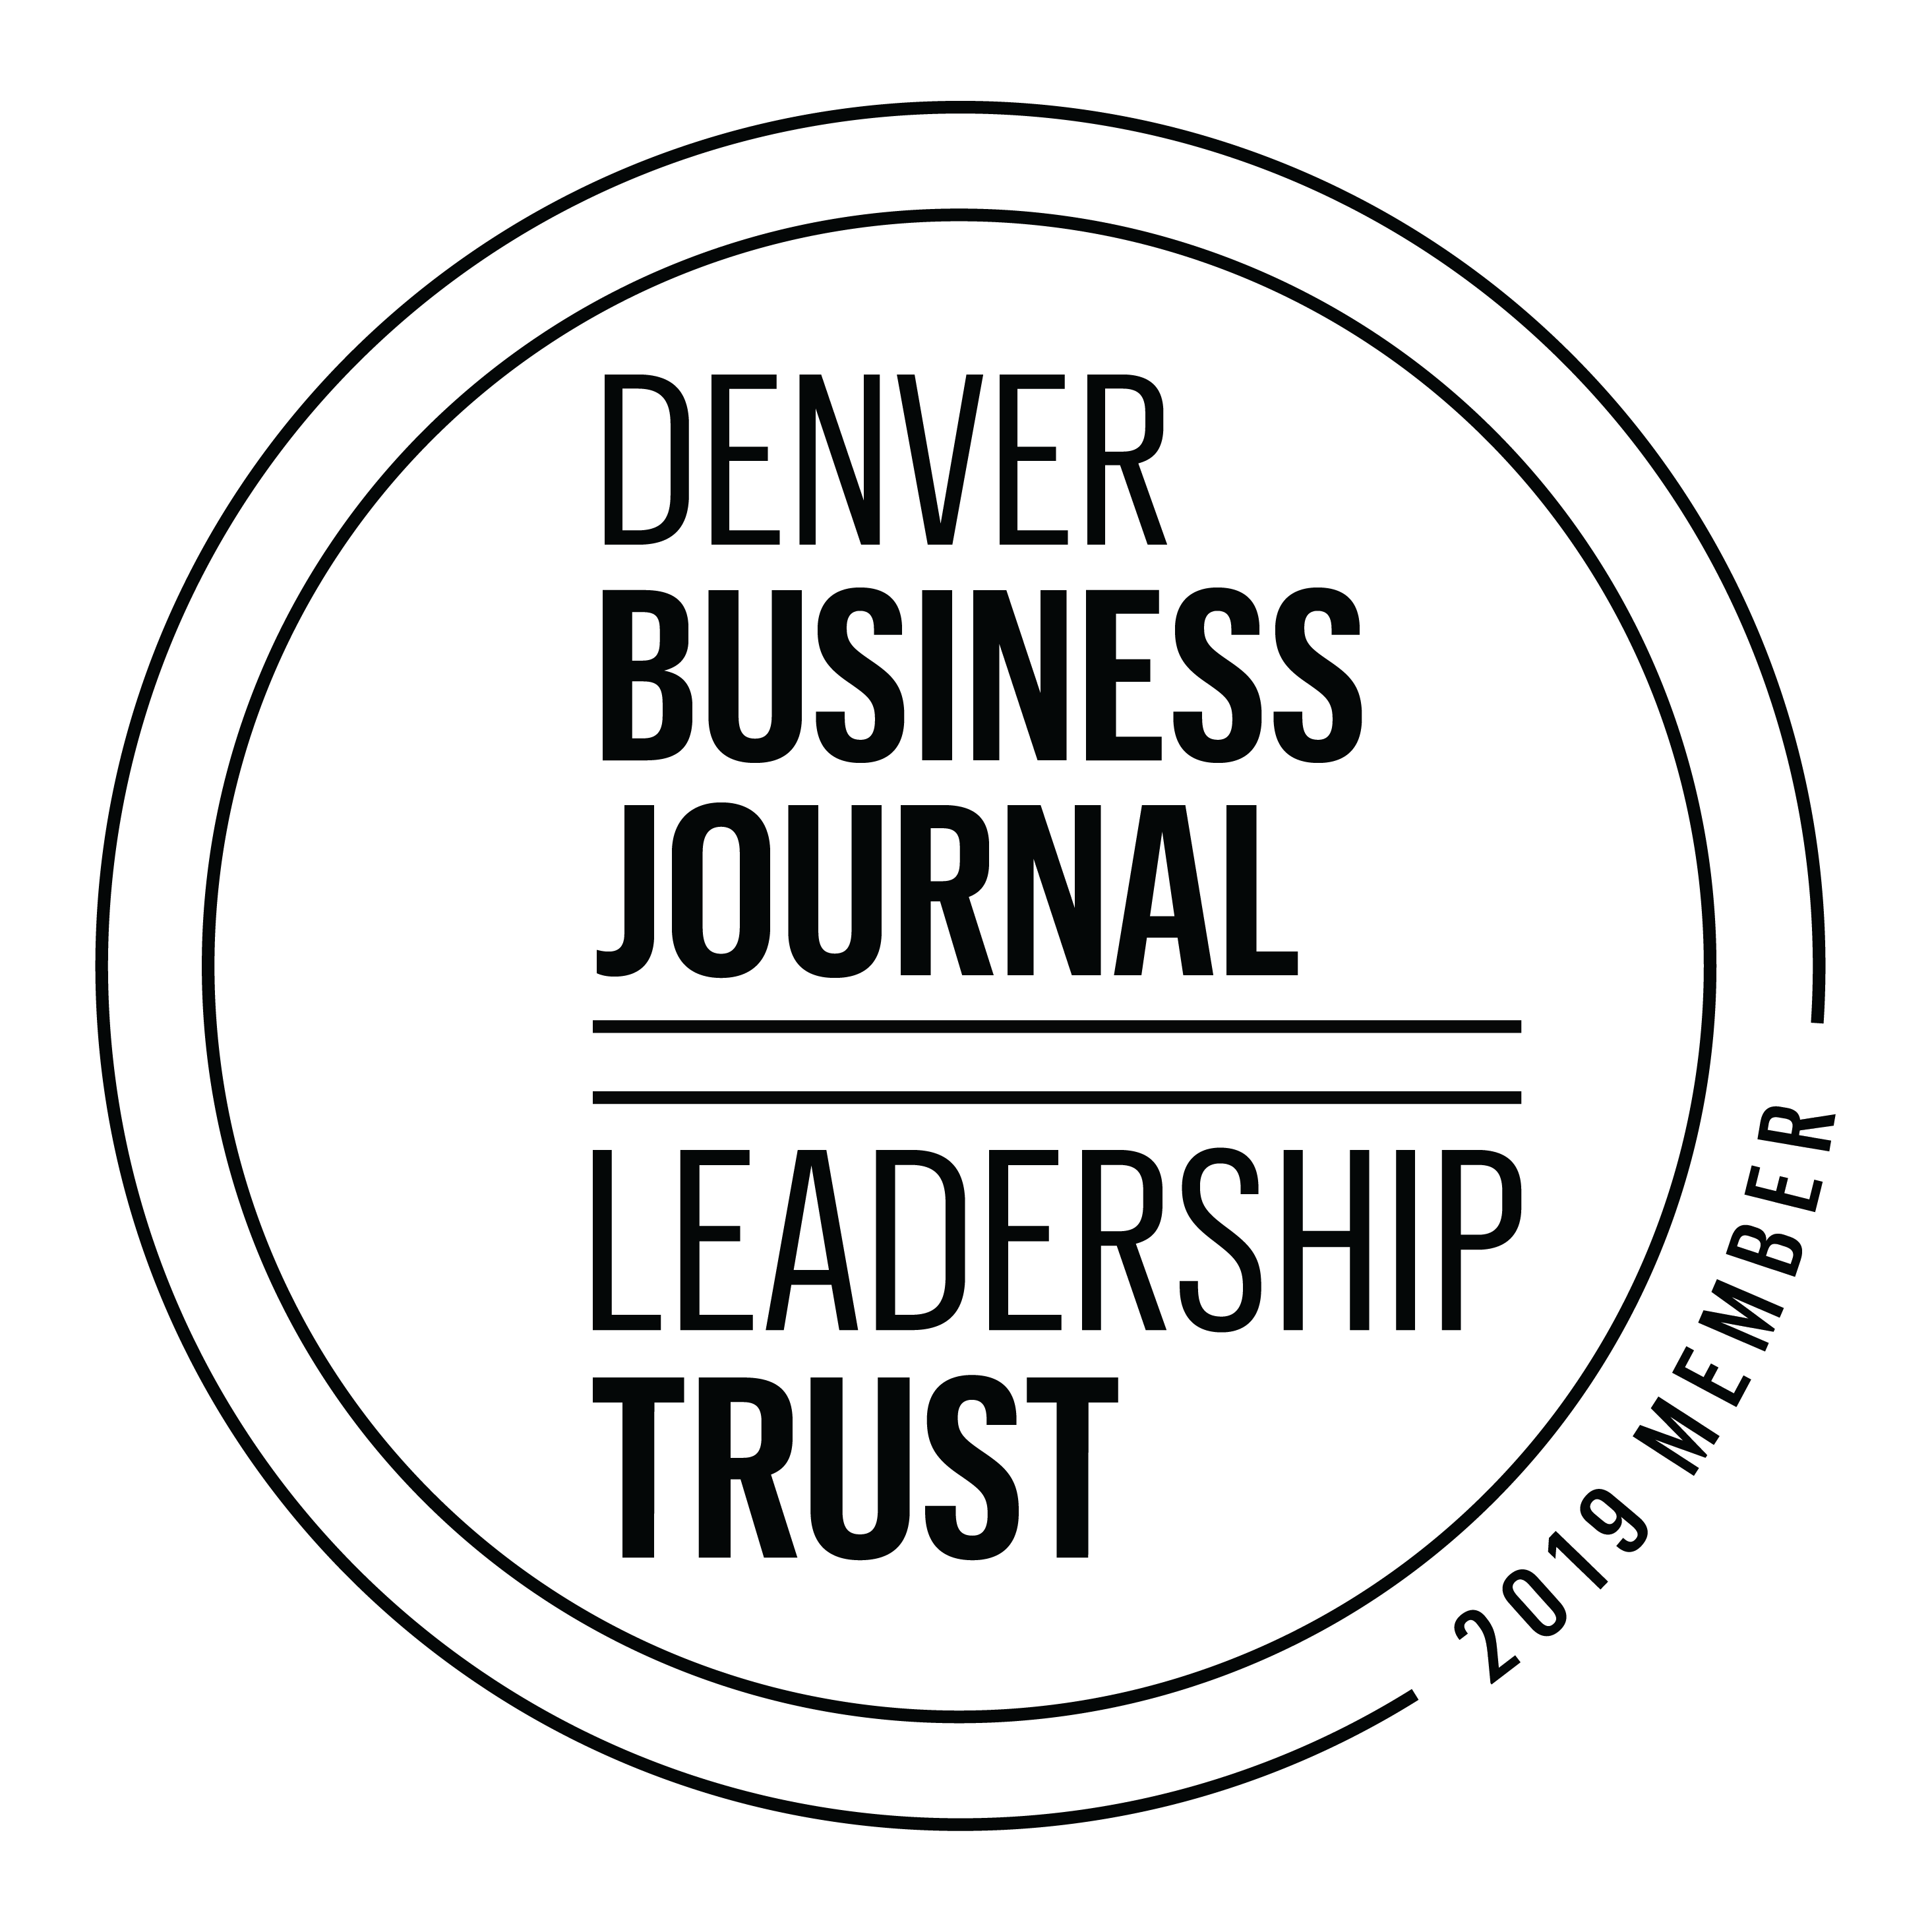 Denver Business Journal News: Pico Digital Marketing Agency Invited